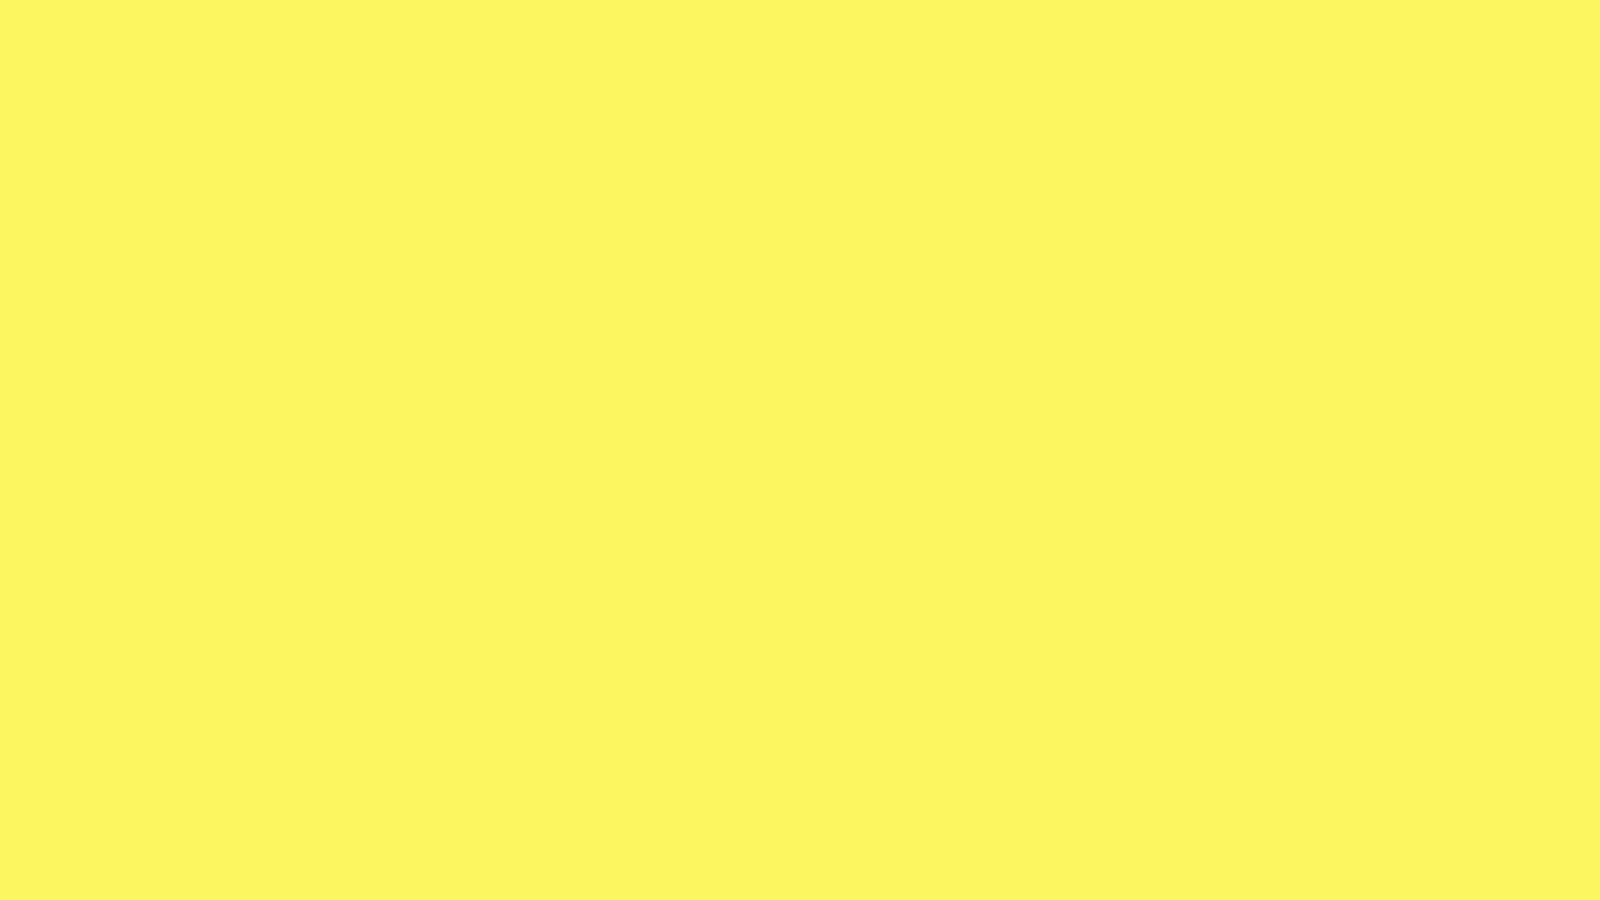 1600x900 Icterine Solid Color Background